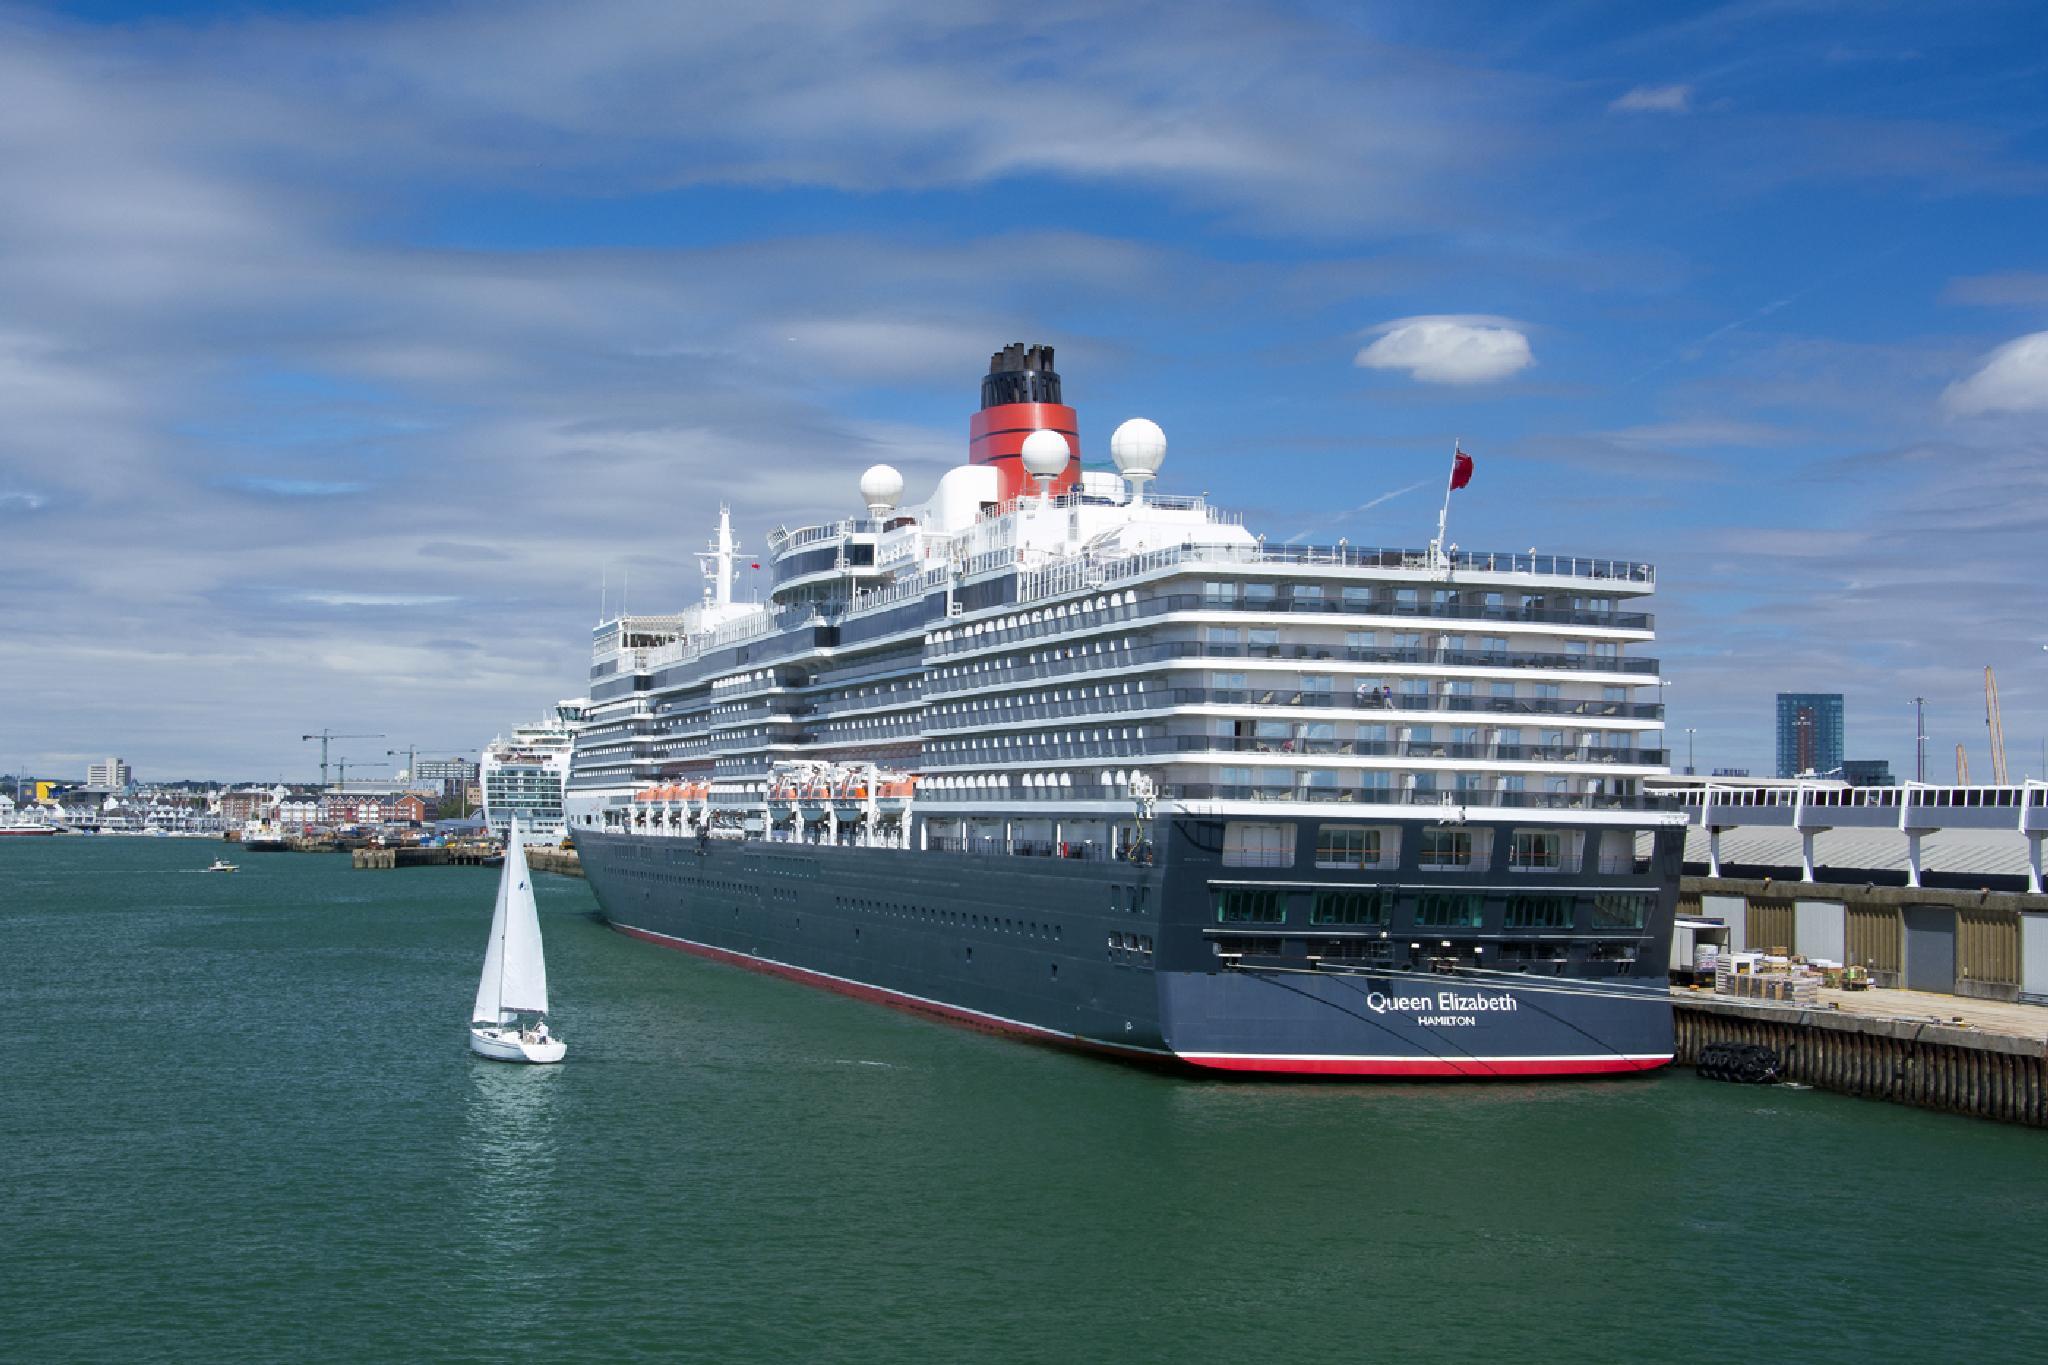 Queen Elizabeth in Her Home Port , Southampton by john.cobham.7